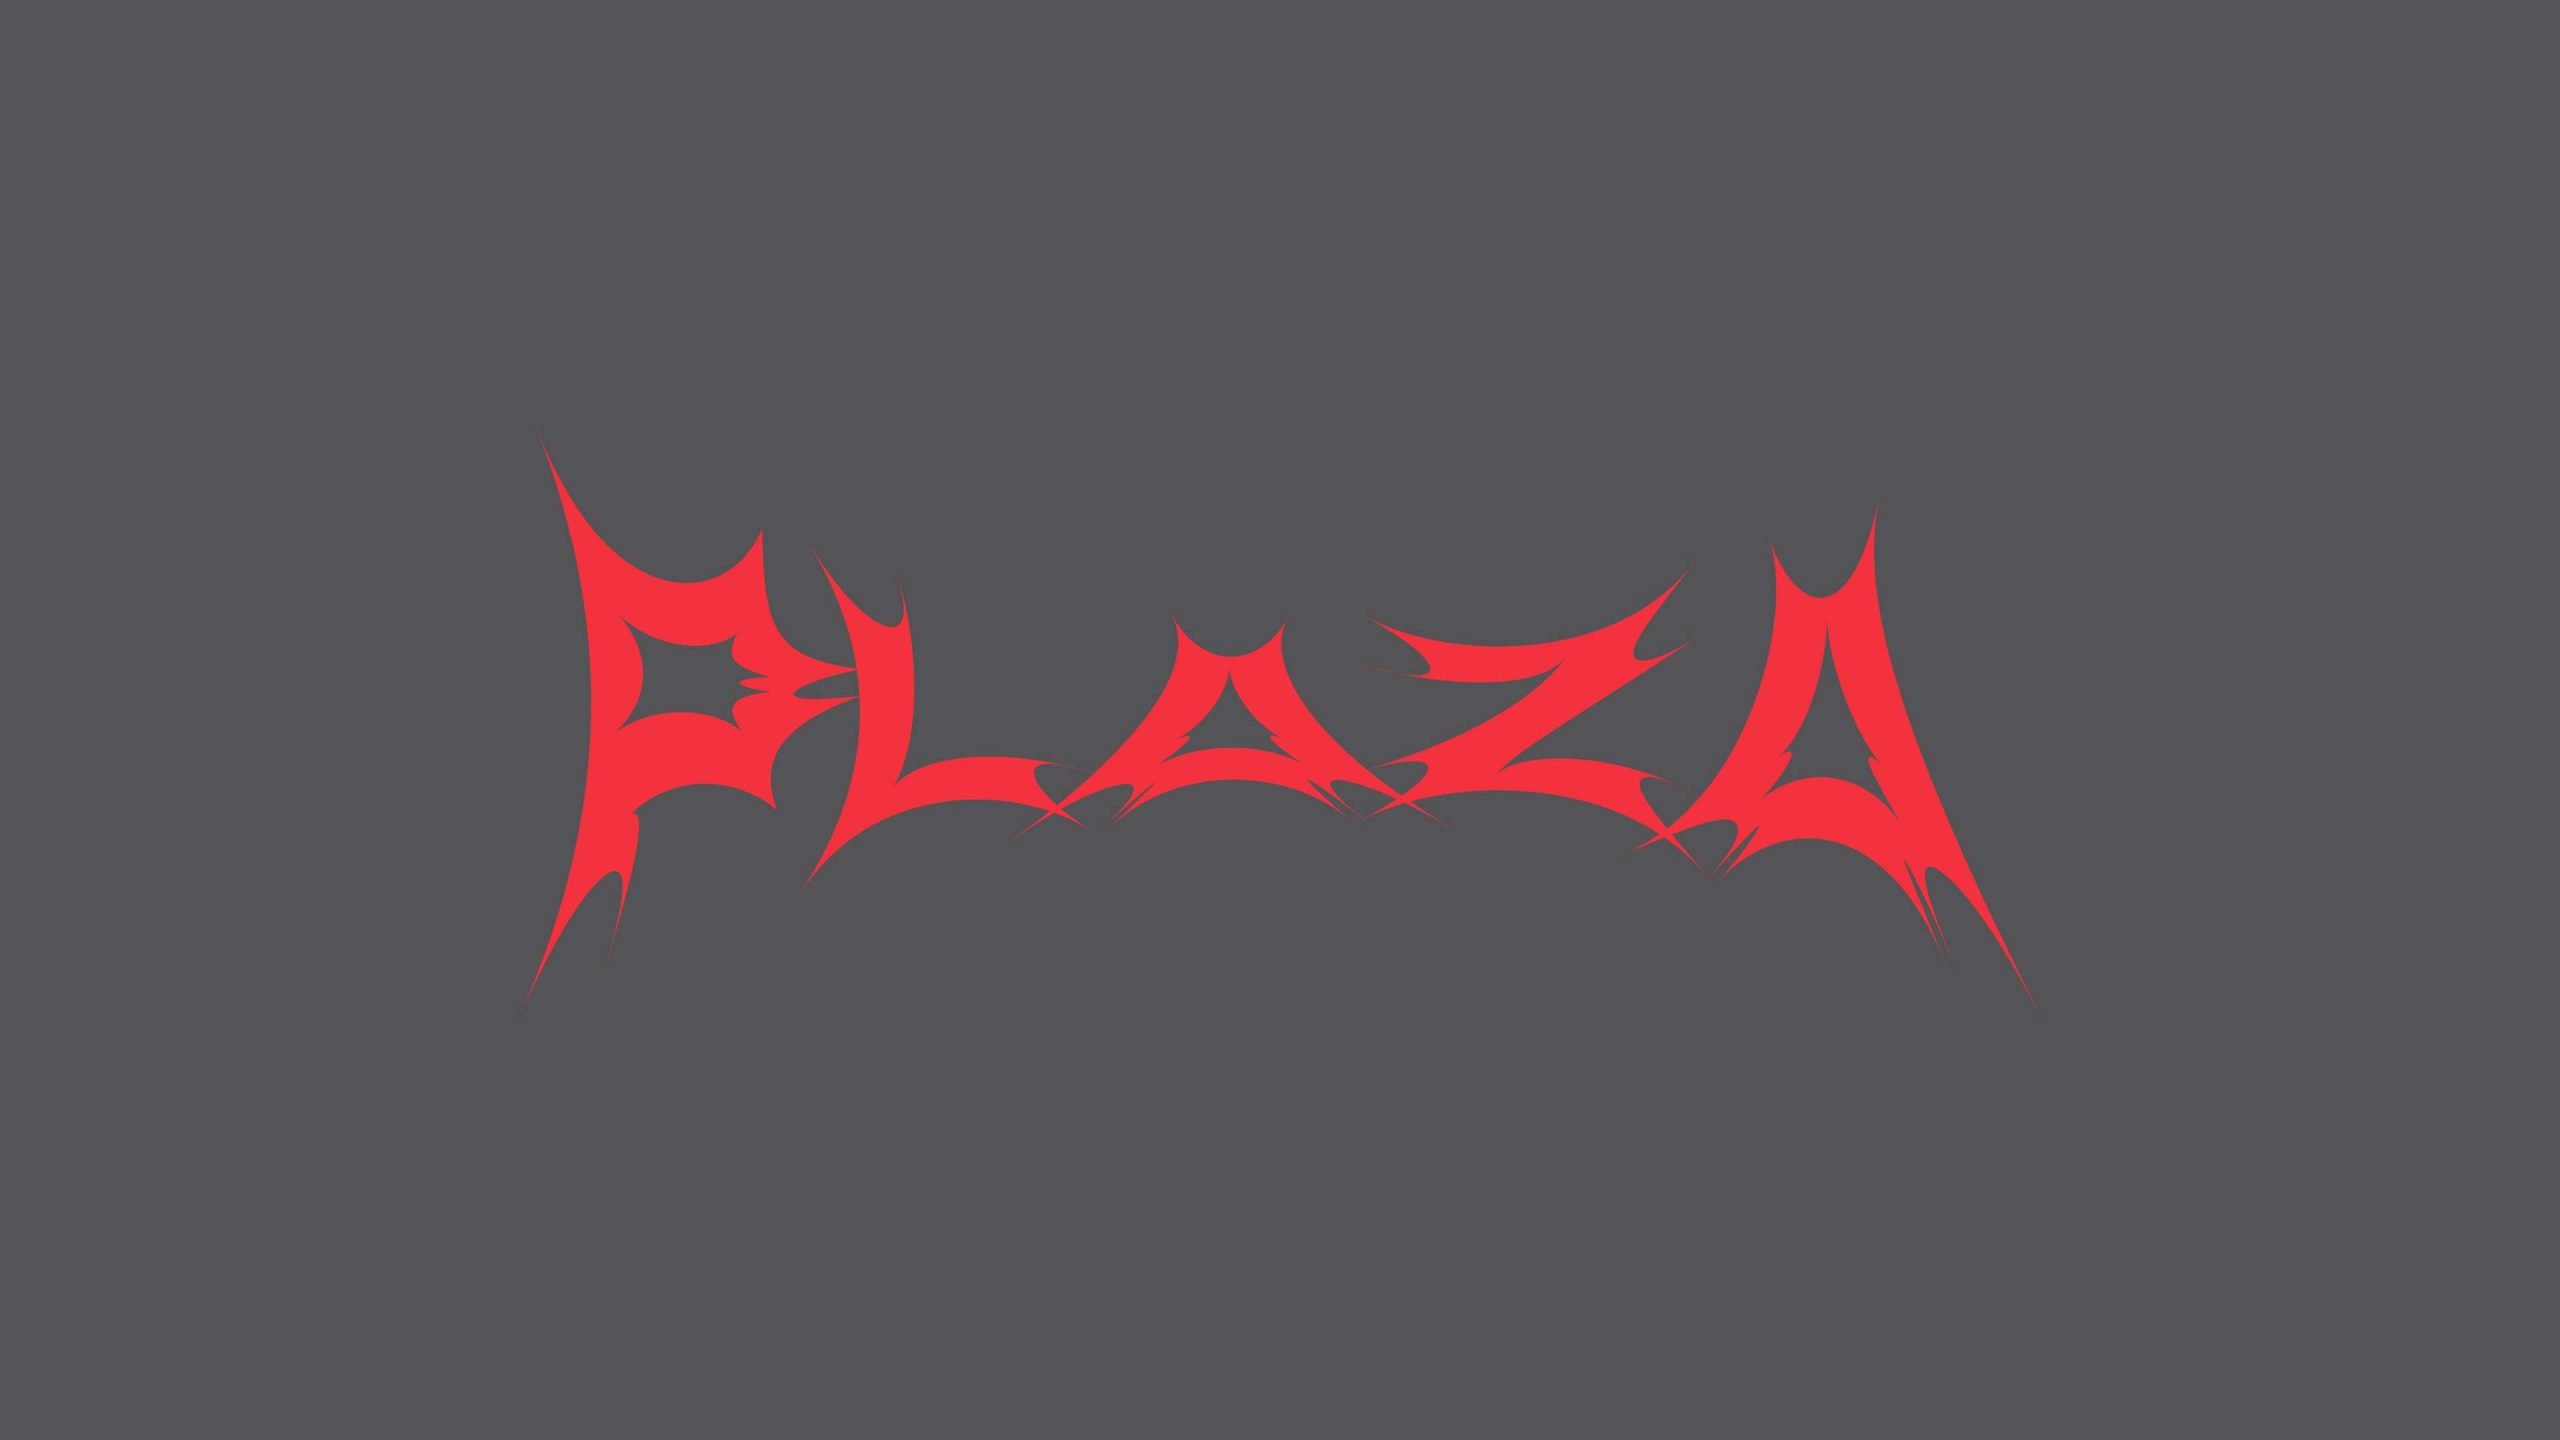 CAPO-PLAZA-TOUR-MERCH-Product-04-Graphics-01